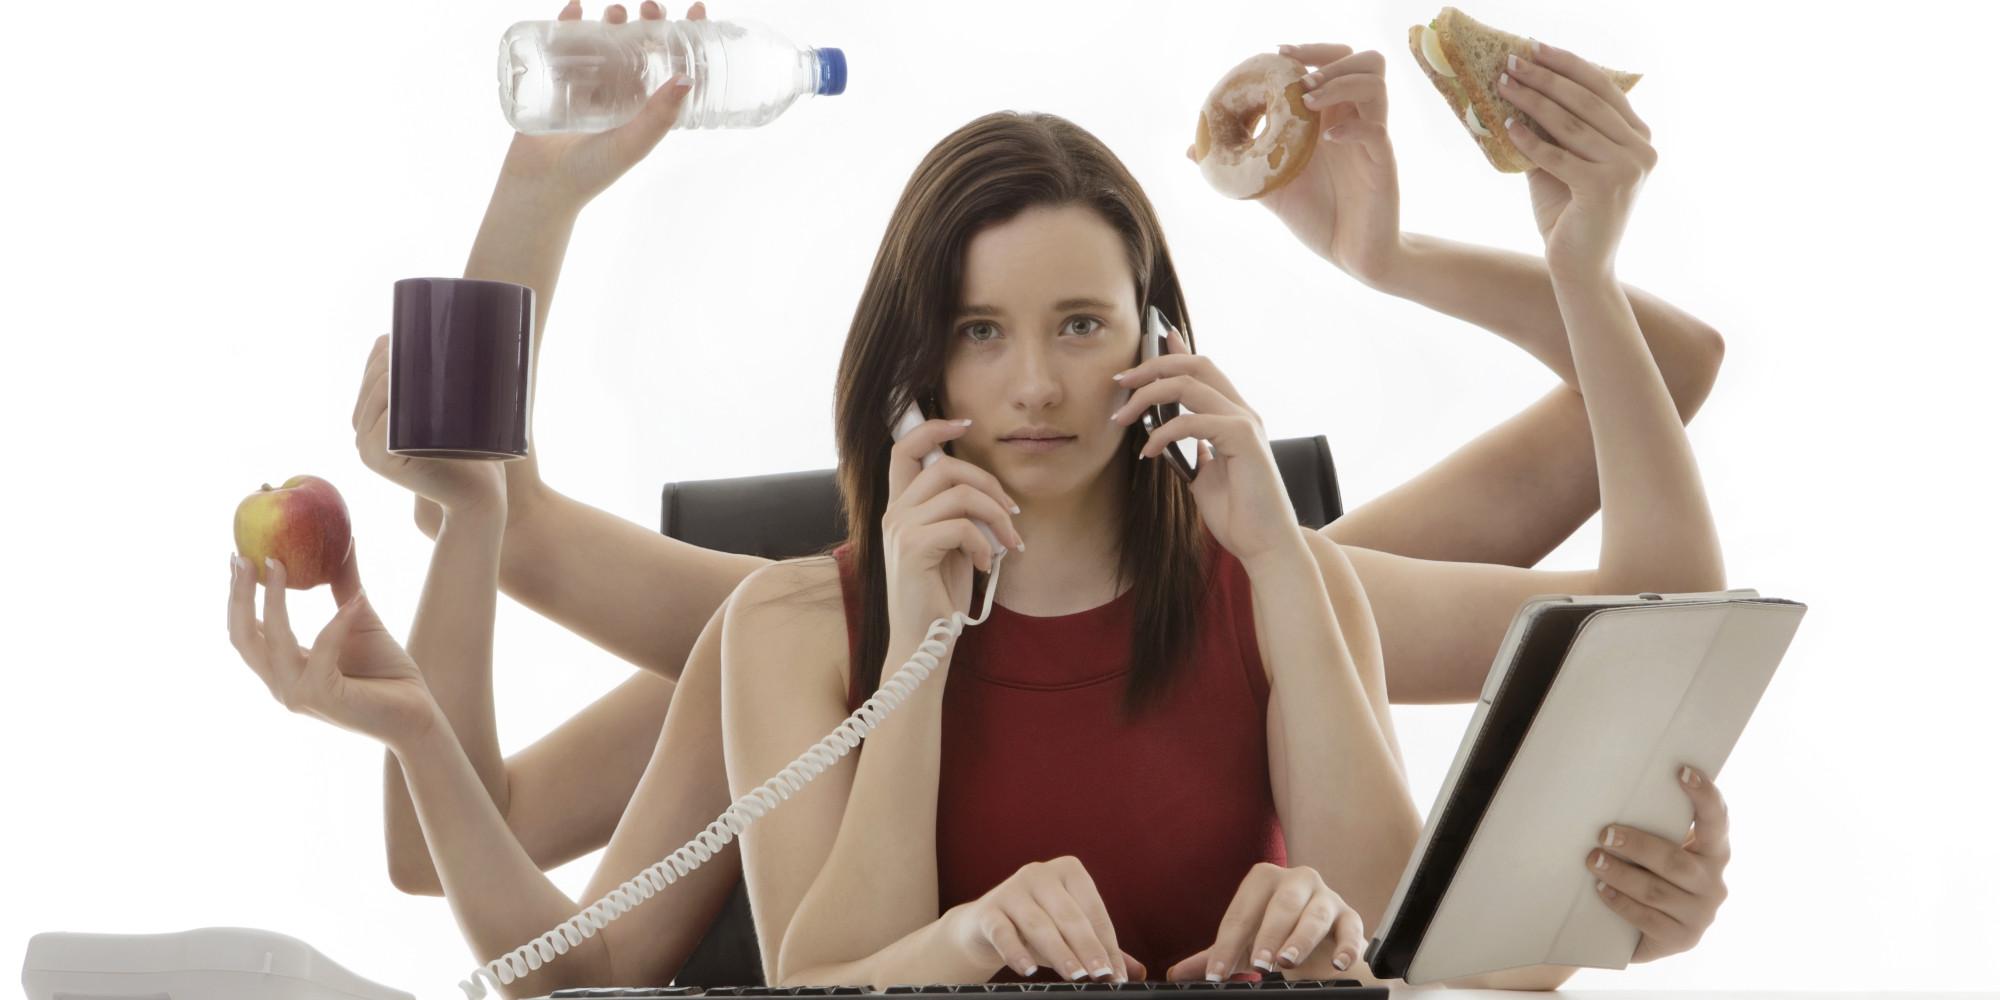 Multitasking: Multitasking Doesn't Work